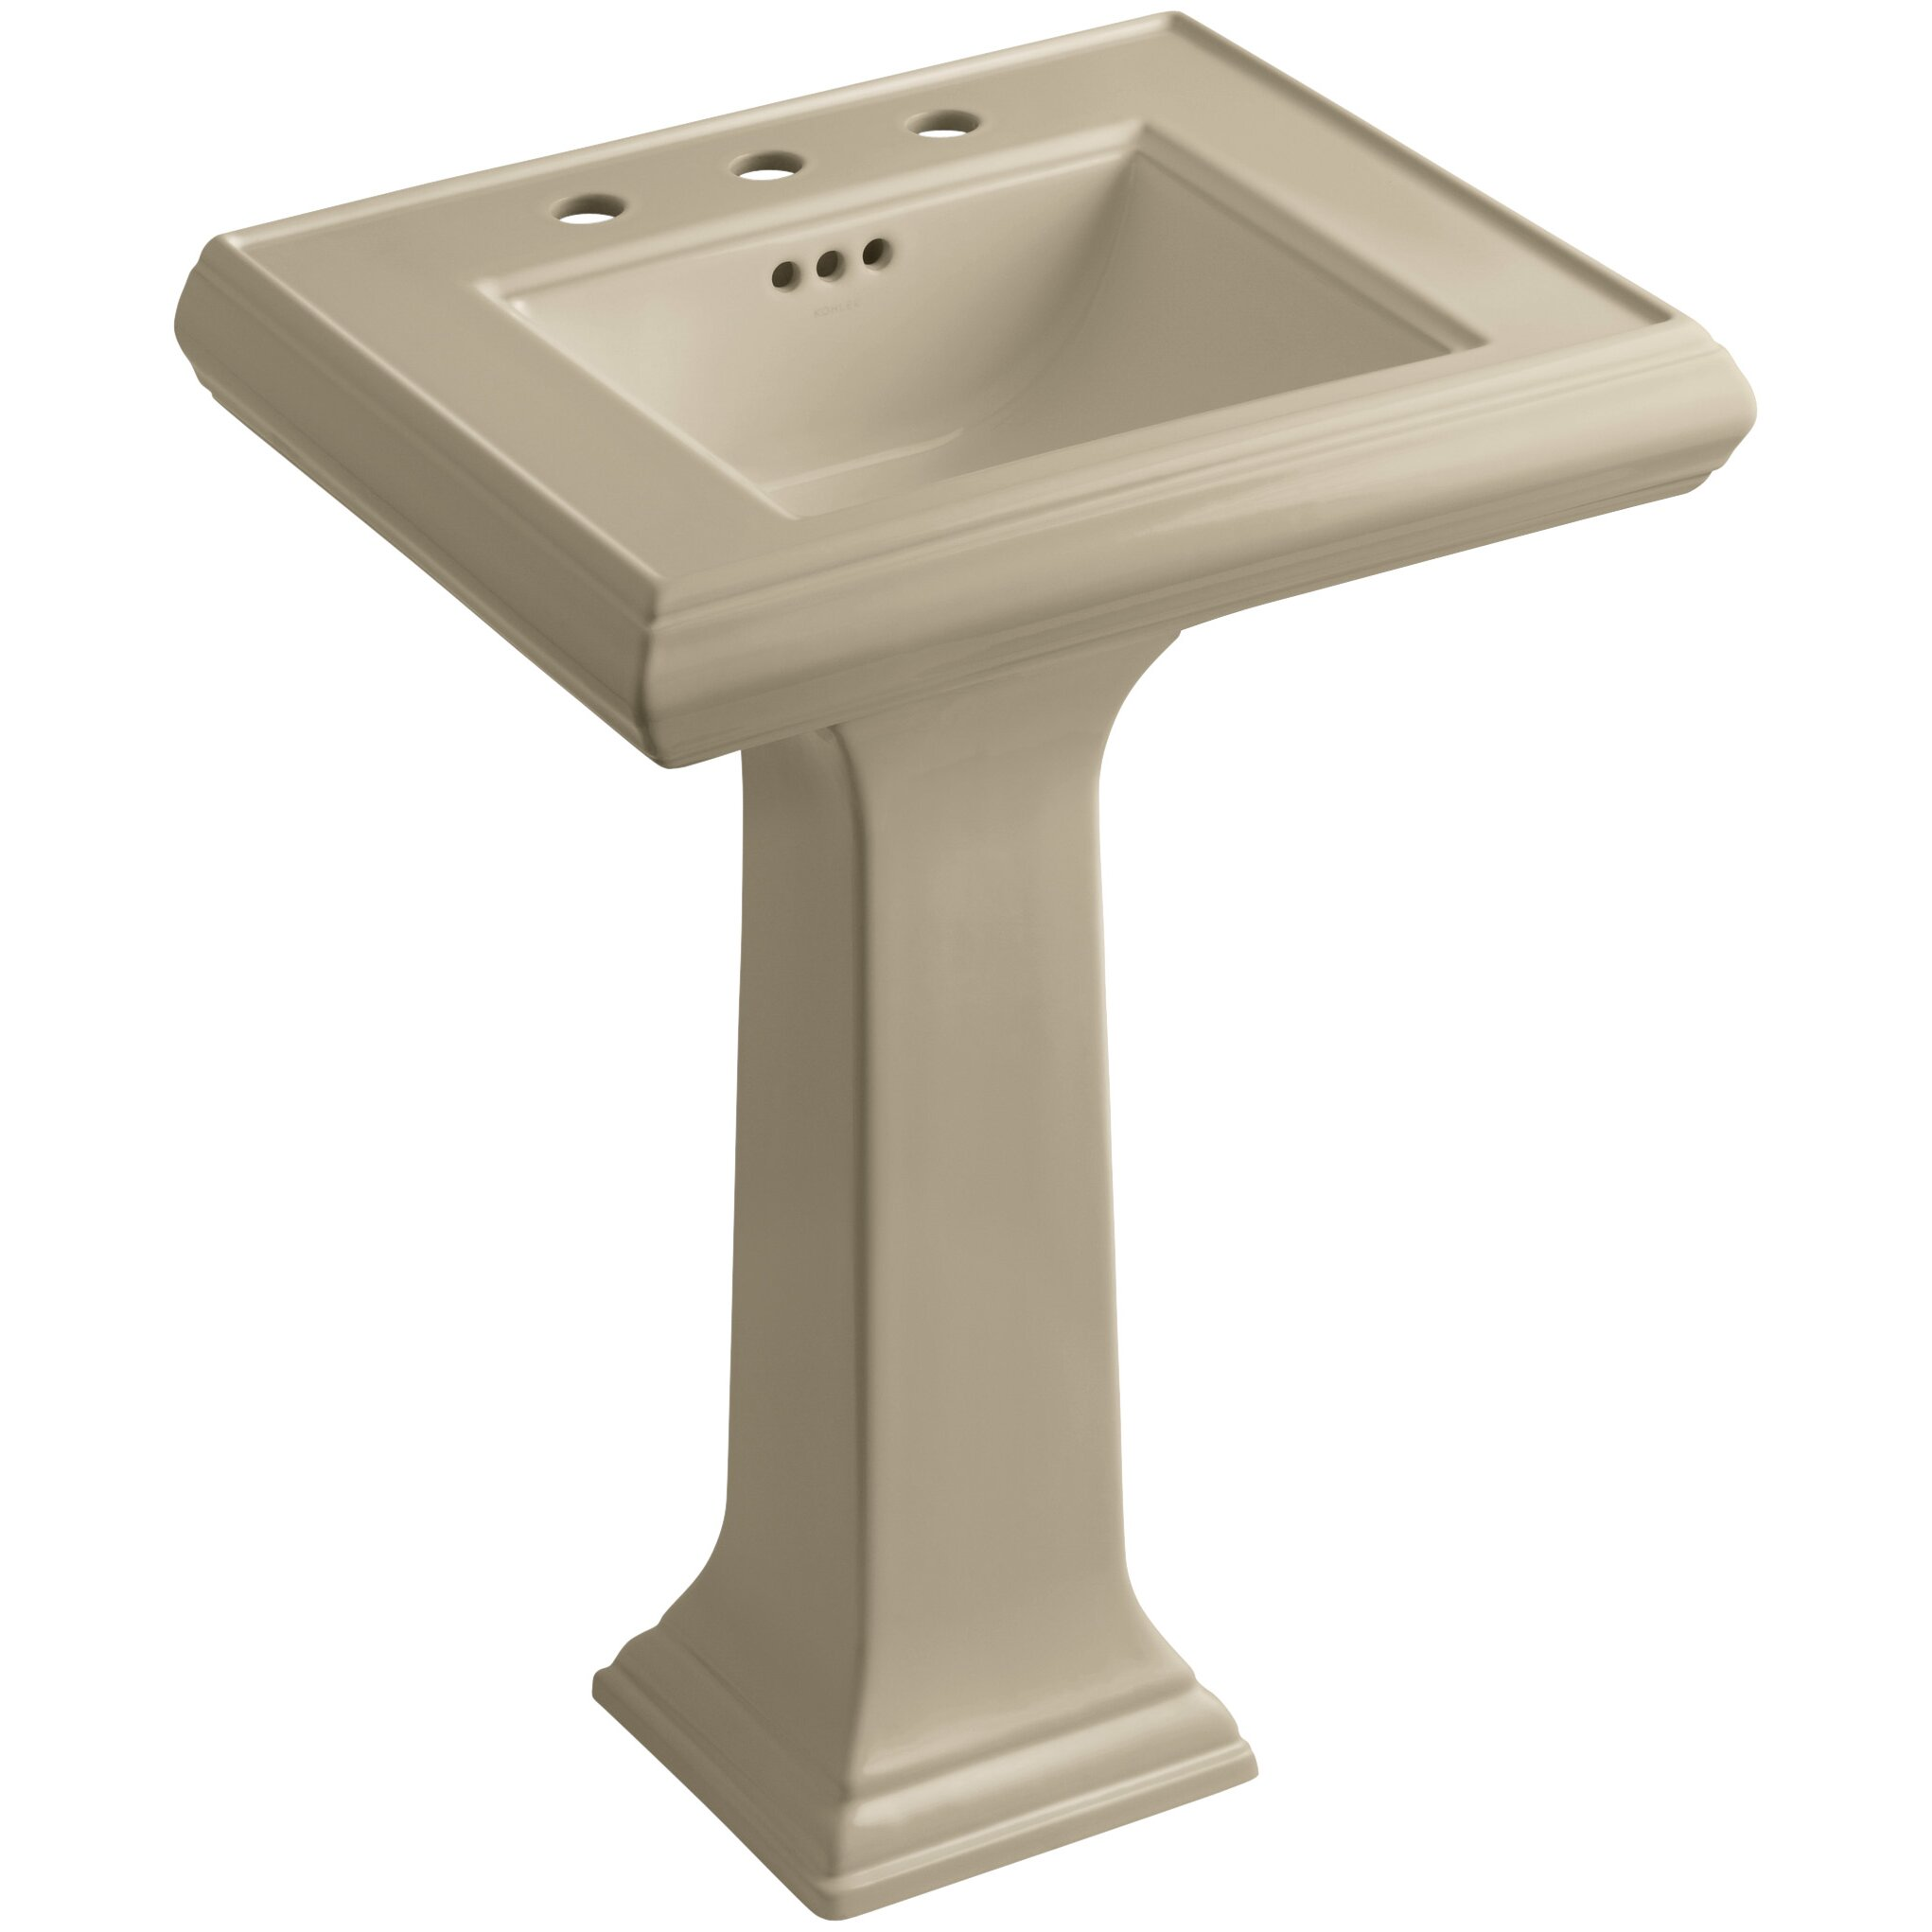 Kohler Memoirs Classic 24 Quot Pedestal Bathroom Sink With 8